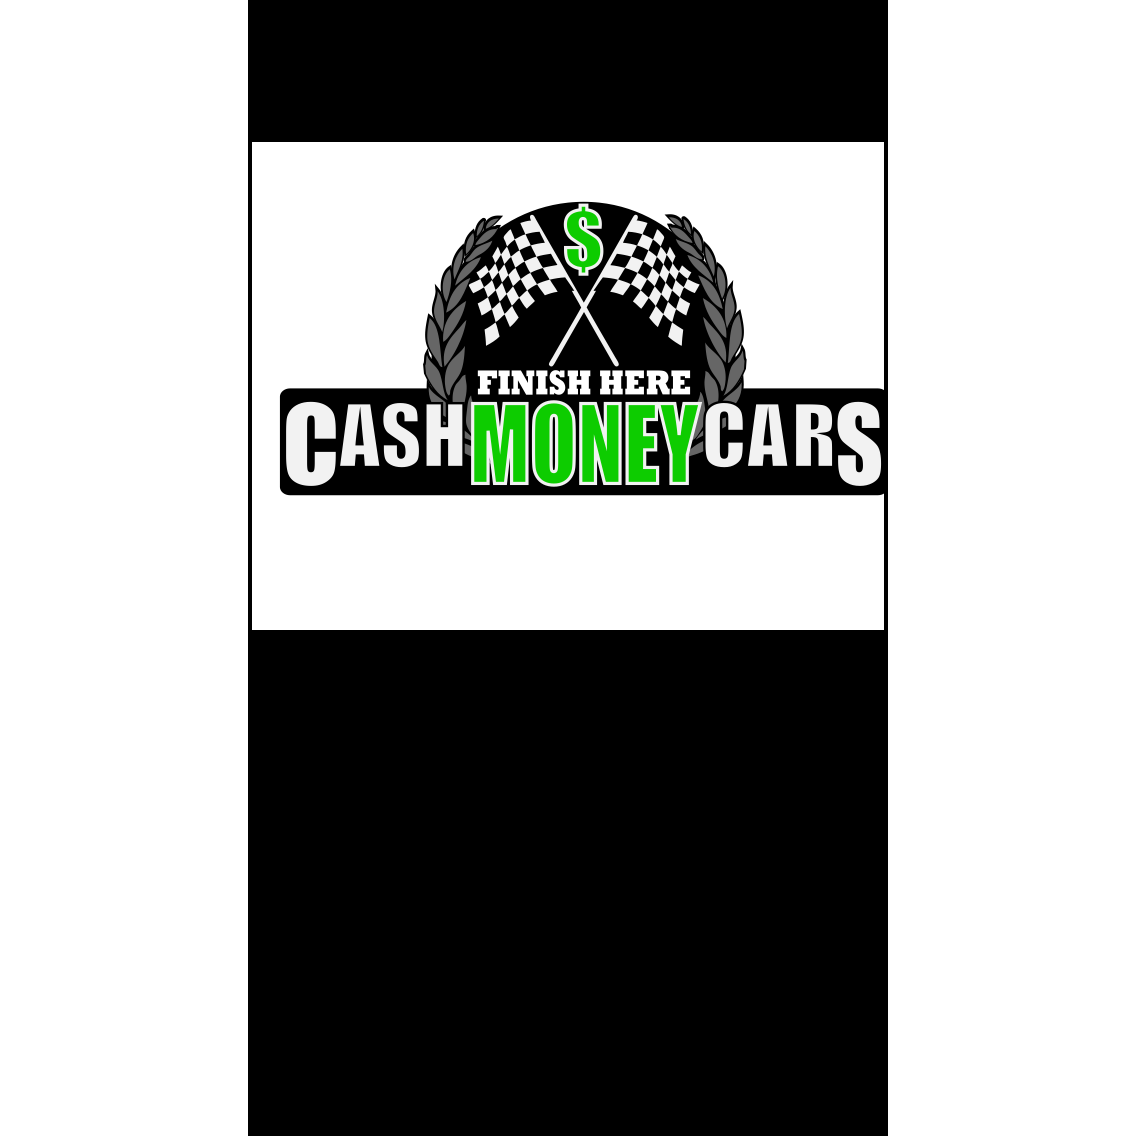 CASH MONEY CARS Coupons Near Me In Laurel